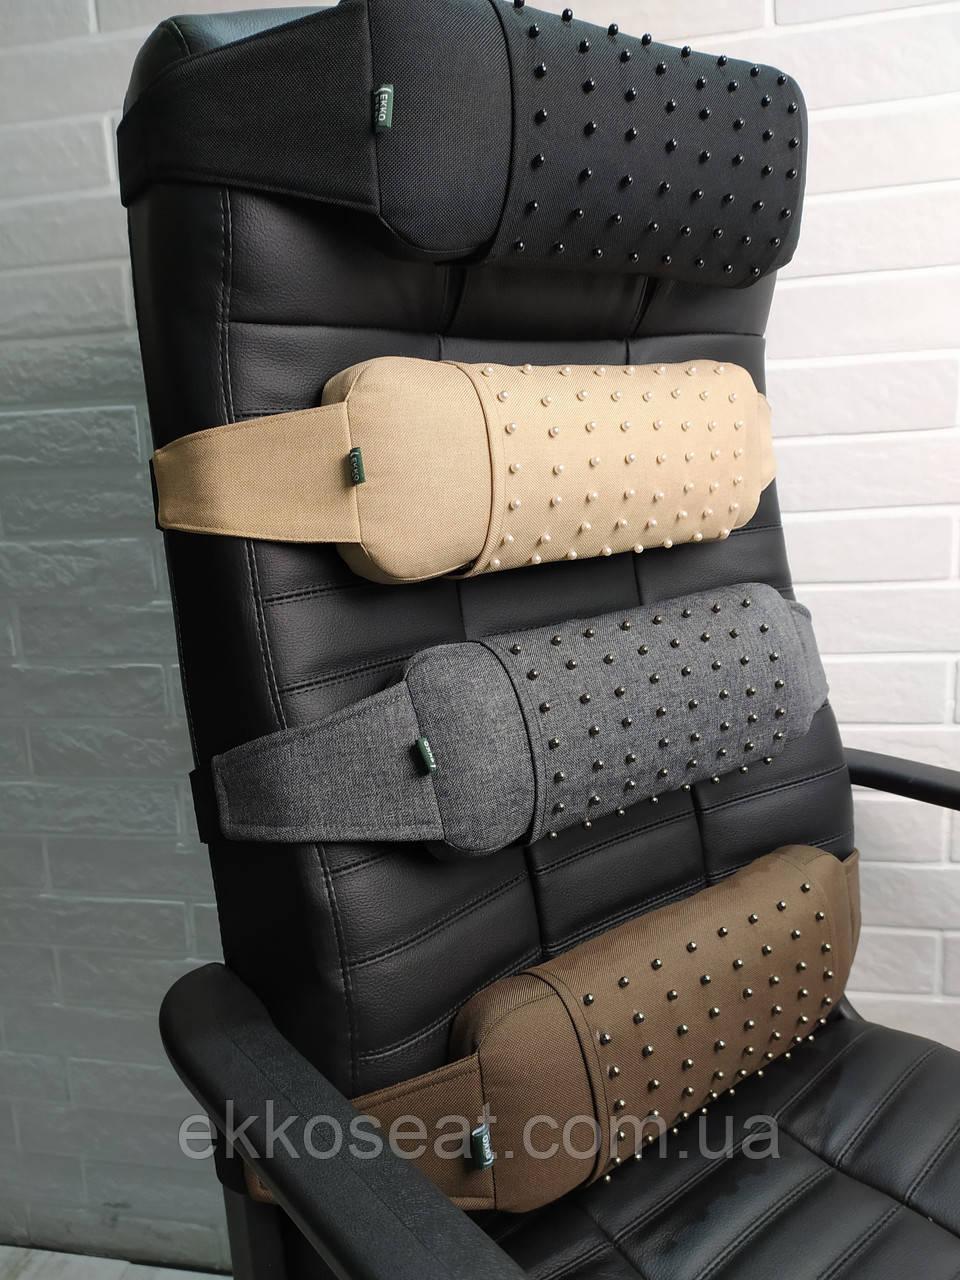 Массажер на кресло подушка техника для очистки воздуха дома